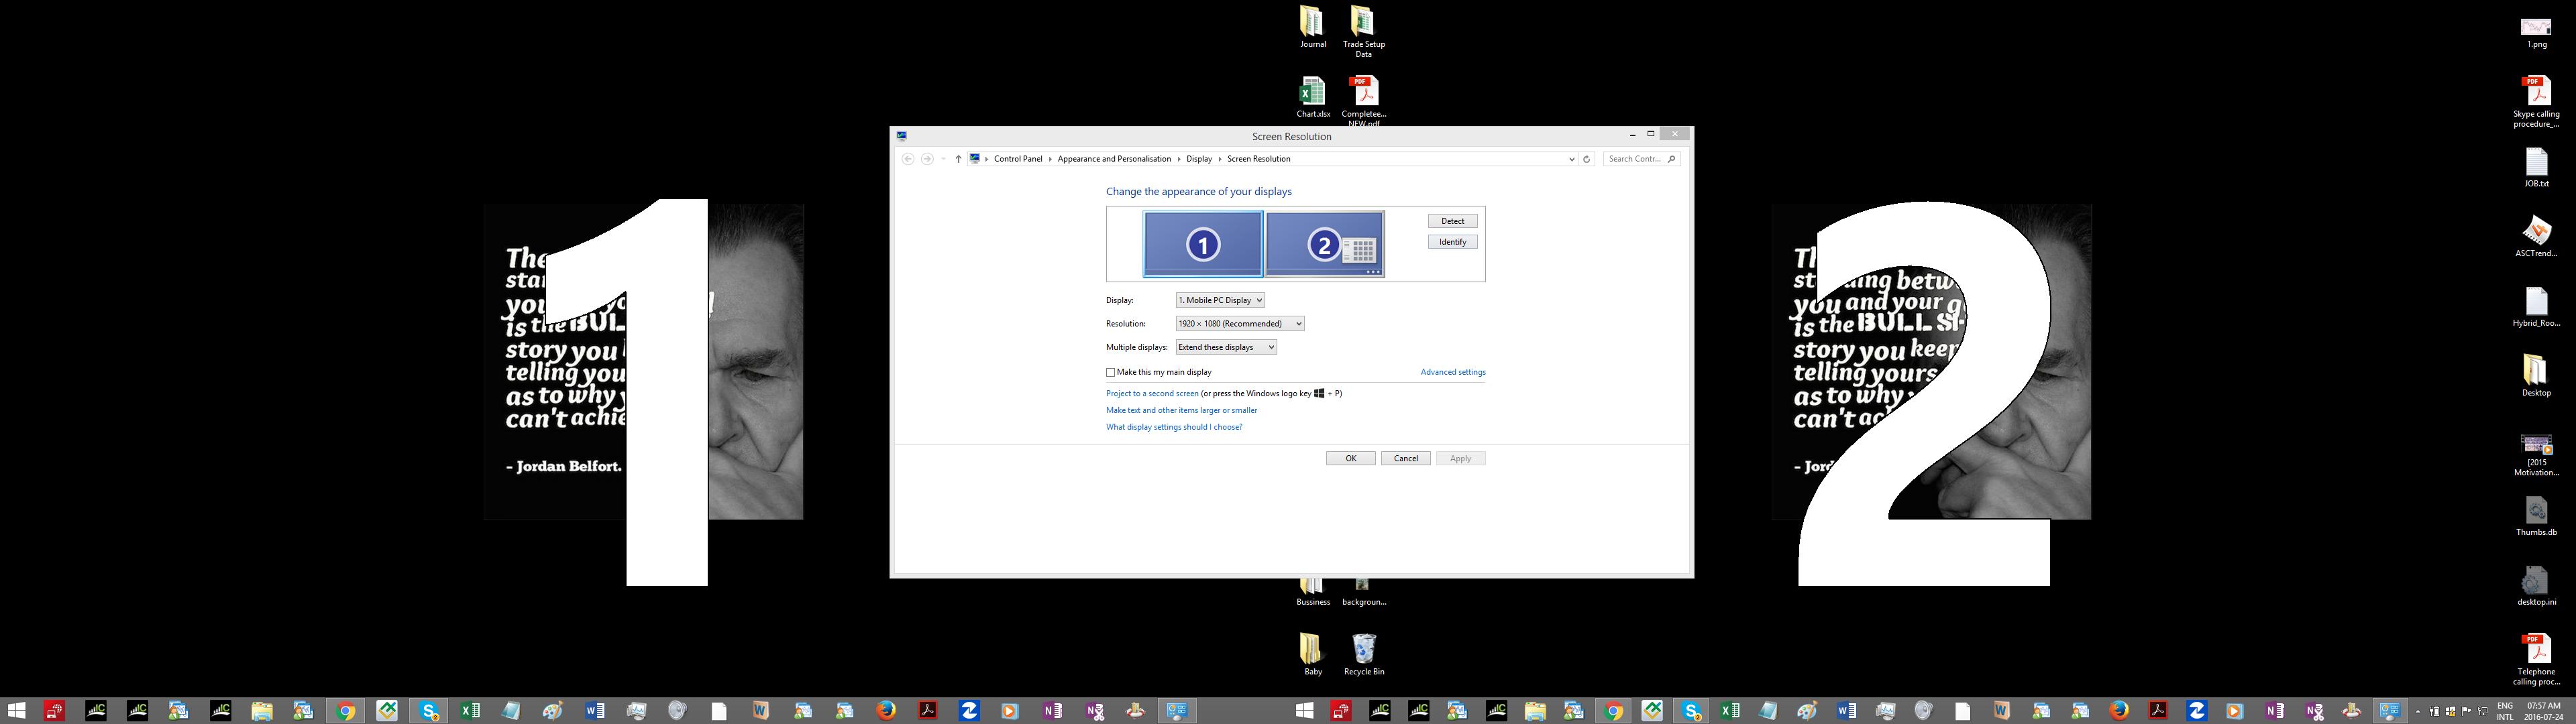 Laptop HP 15-f1233wm: white screen after login on Windows 10